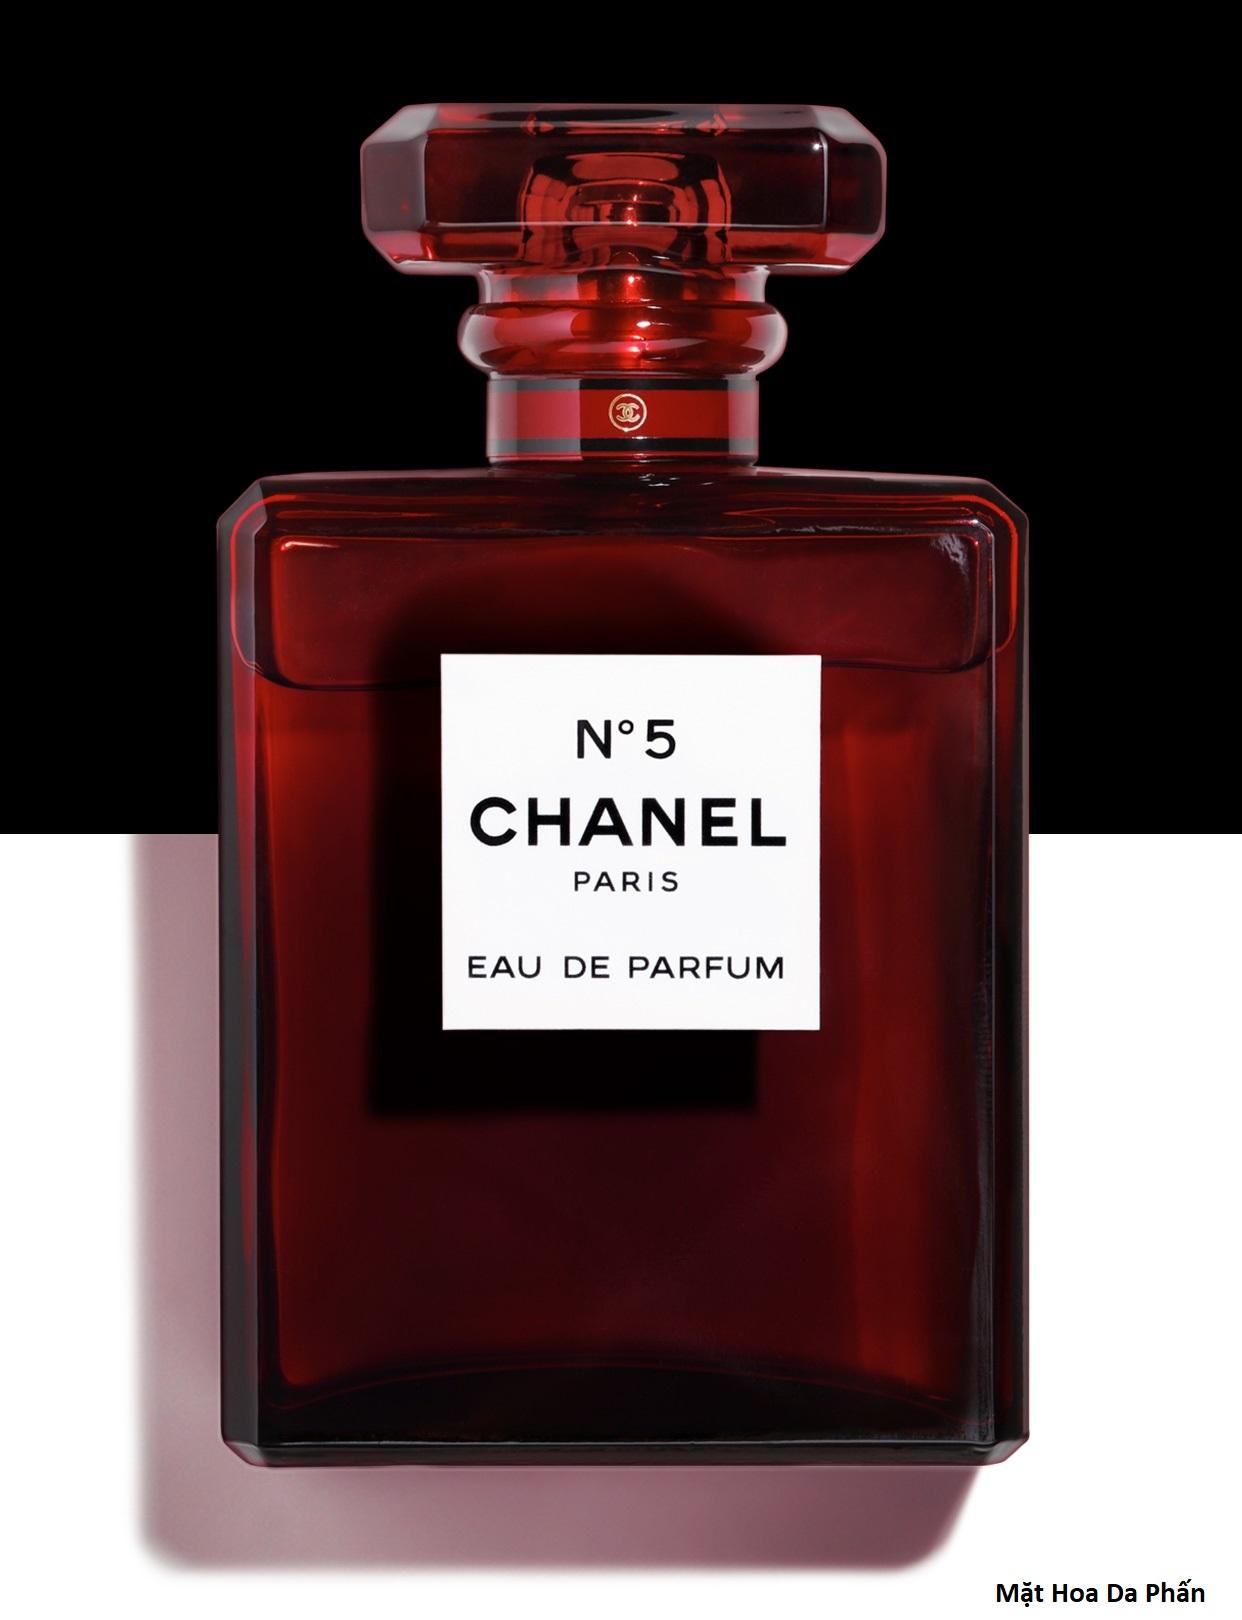 Nước Hoa Chanel Paris No.5 Edp (Red 100Ml)